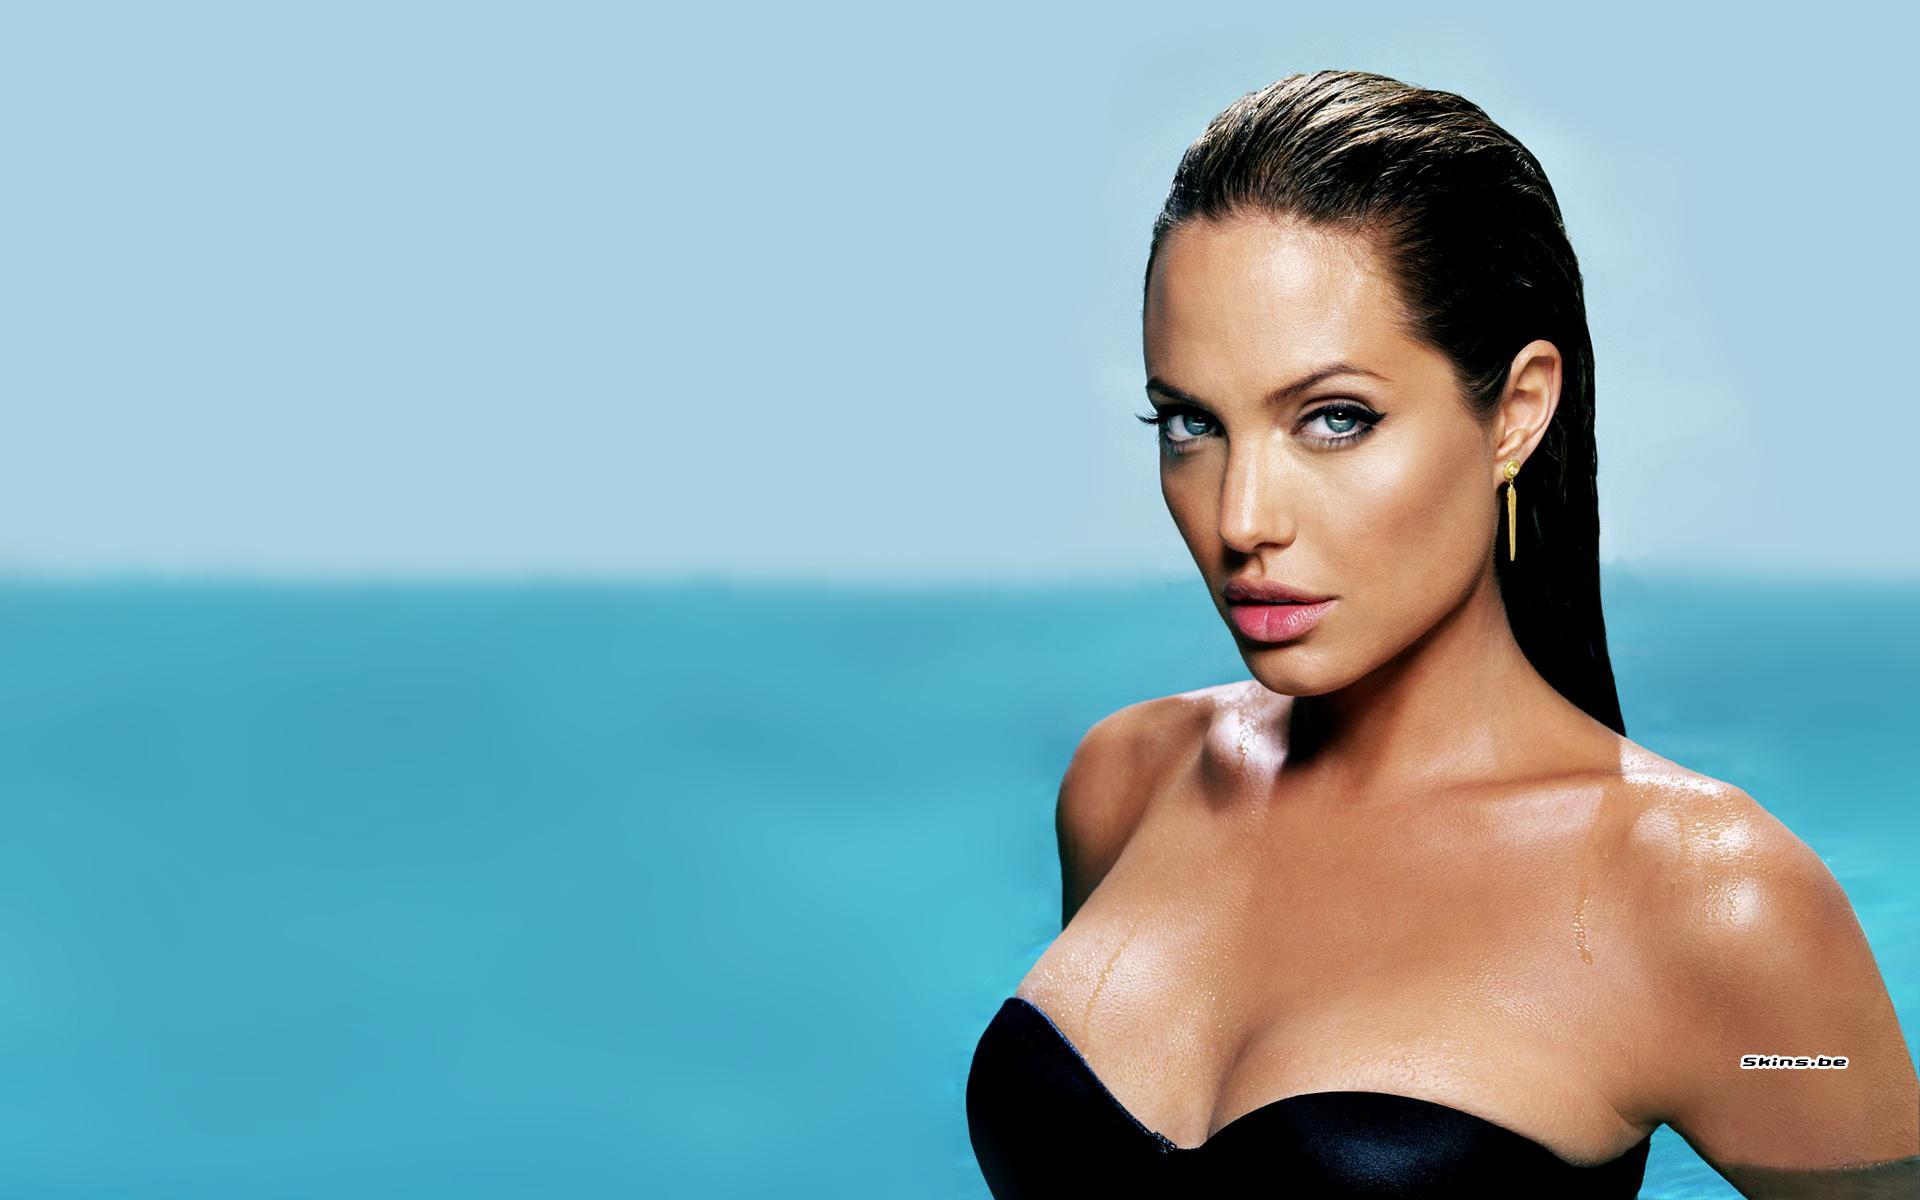 Angelina Jolieye yeni darbe